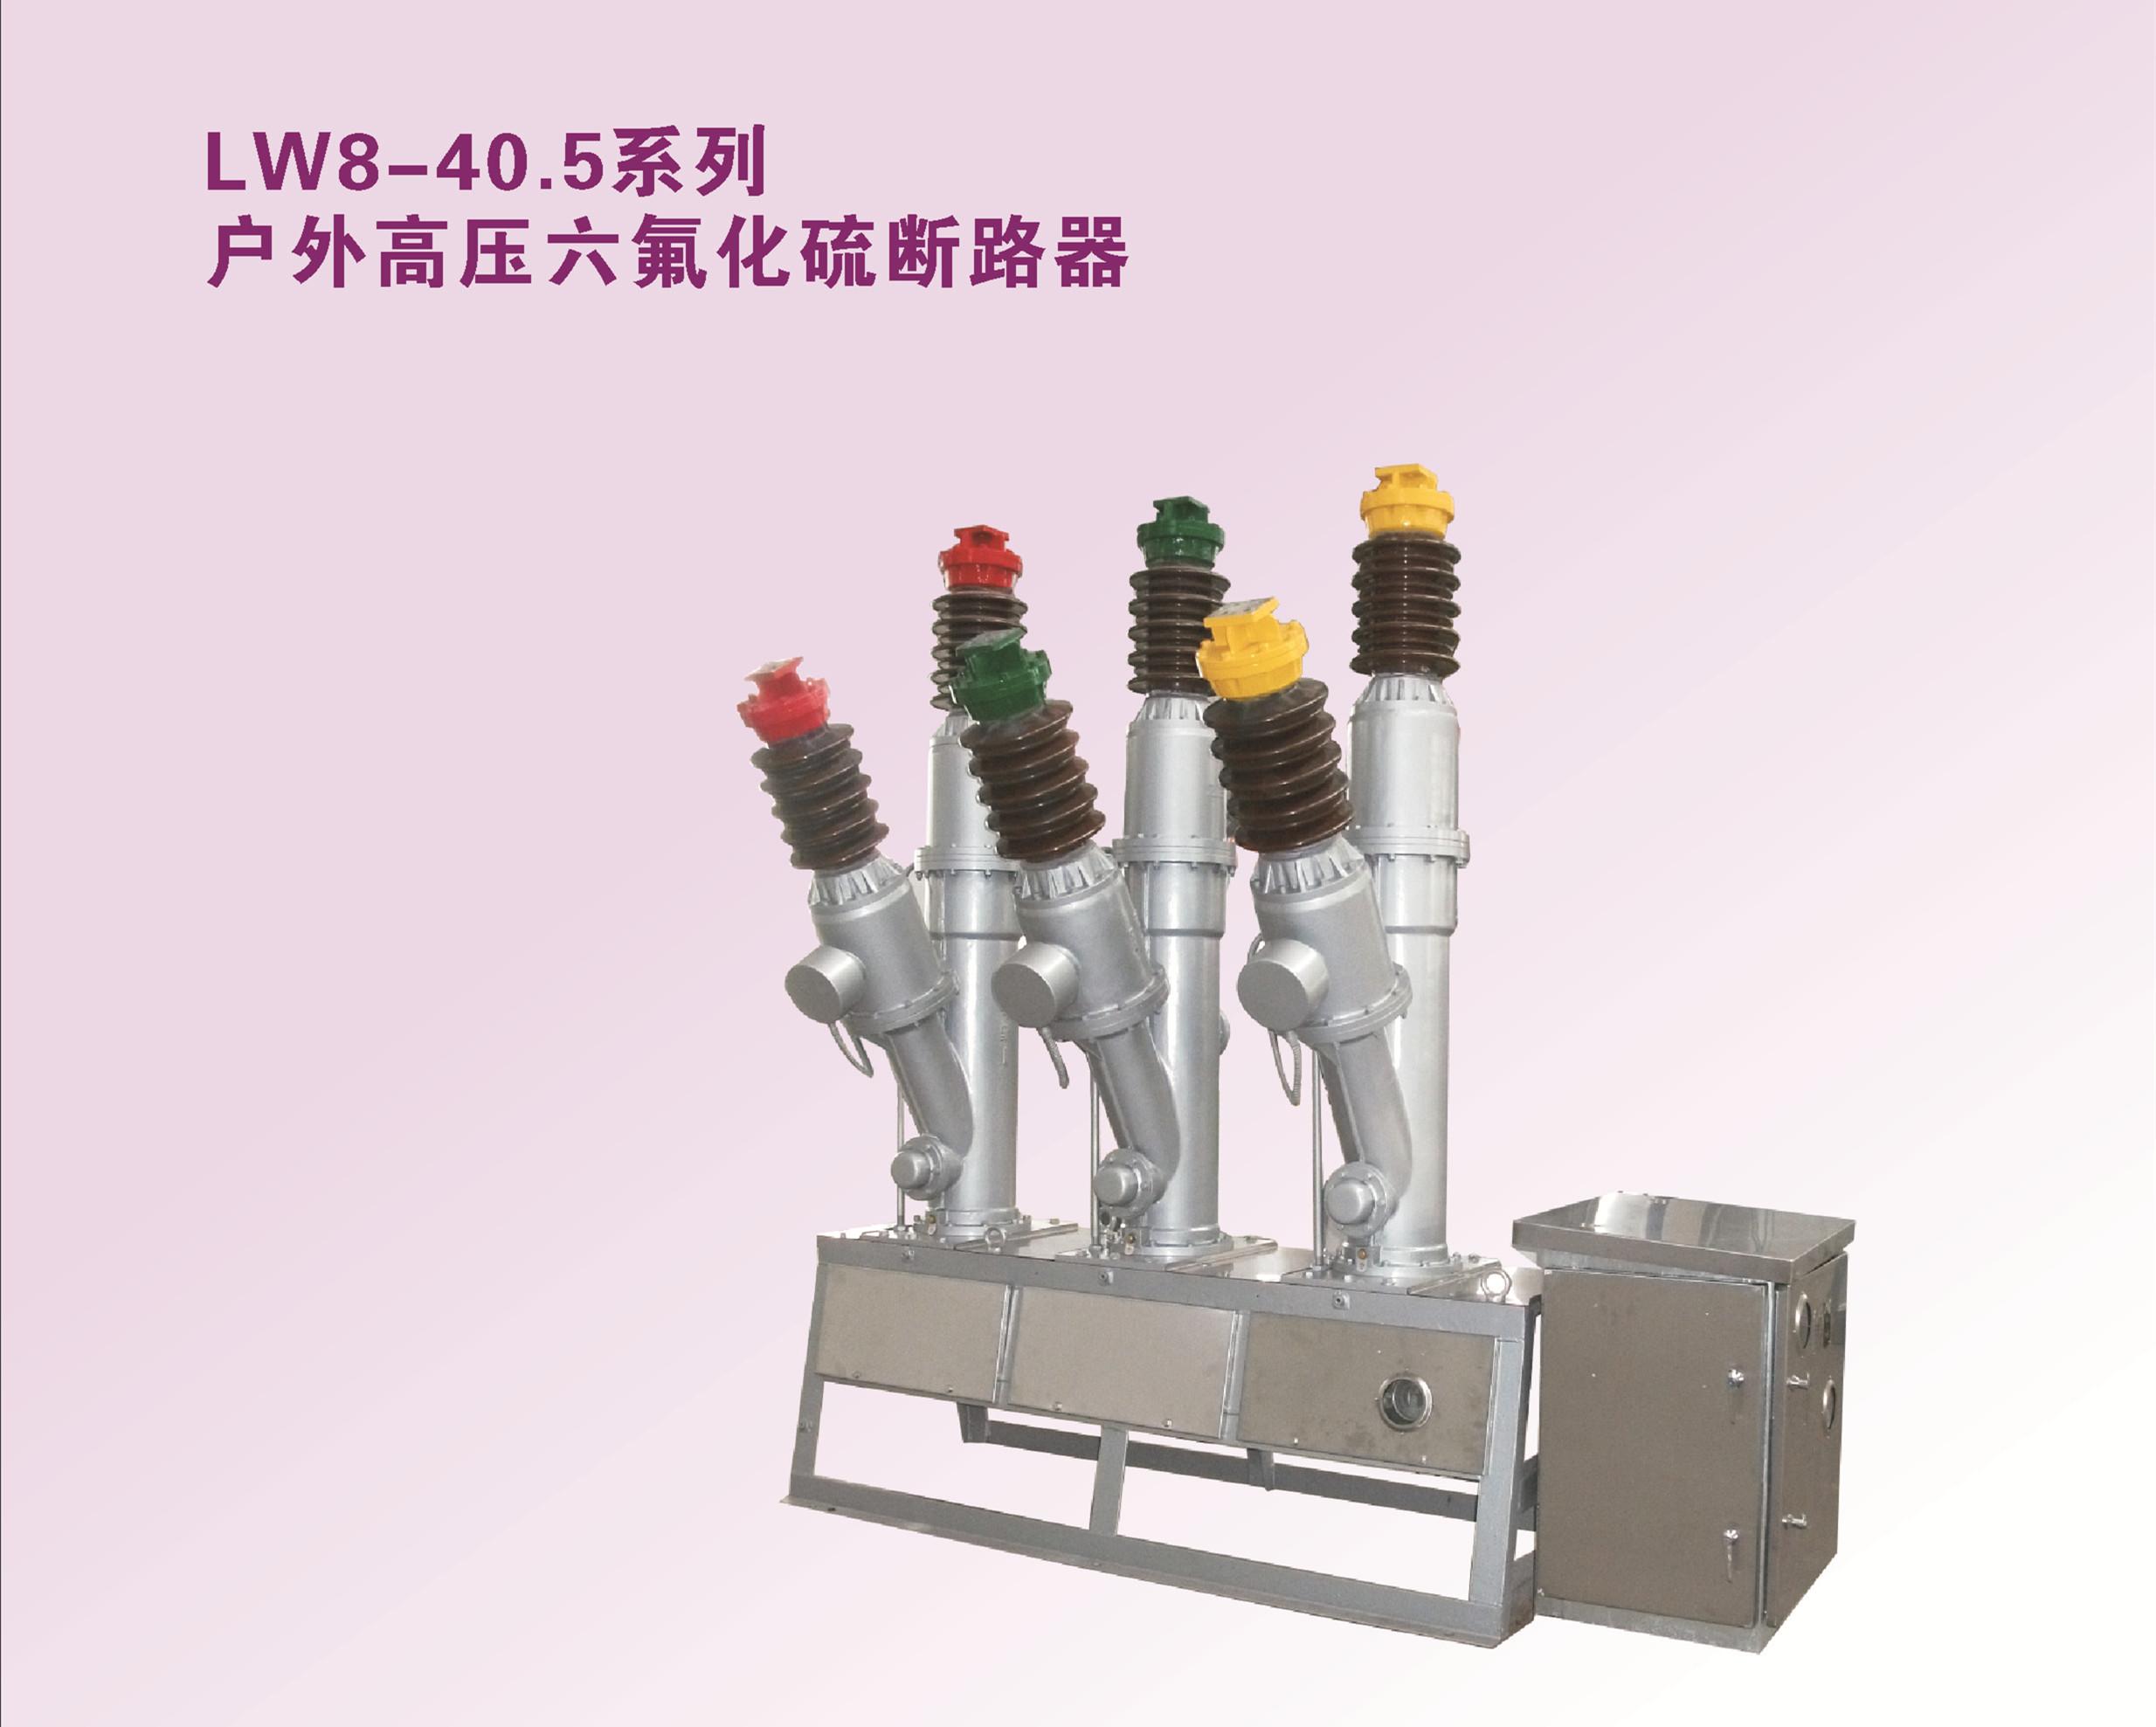 LW8A-40.5户外高压六氟化硫断路器